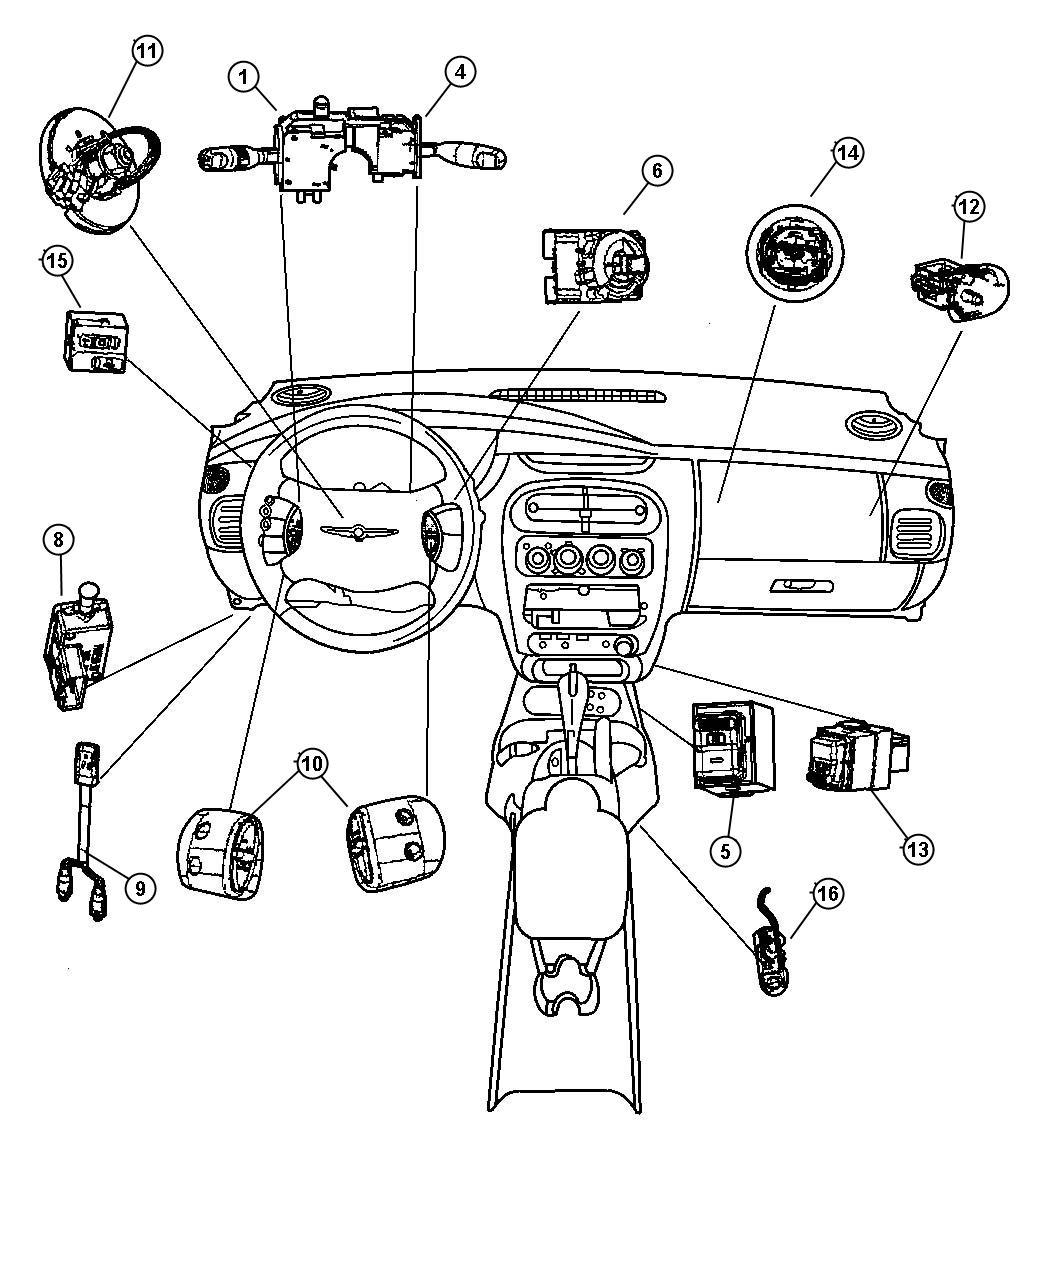 Dodge Neon Clockspring Nhm 5 Circuit With Airbag